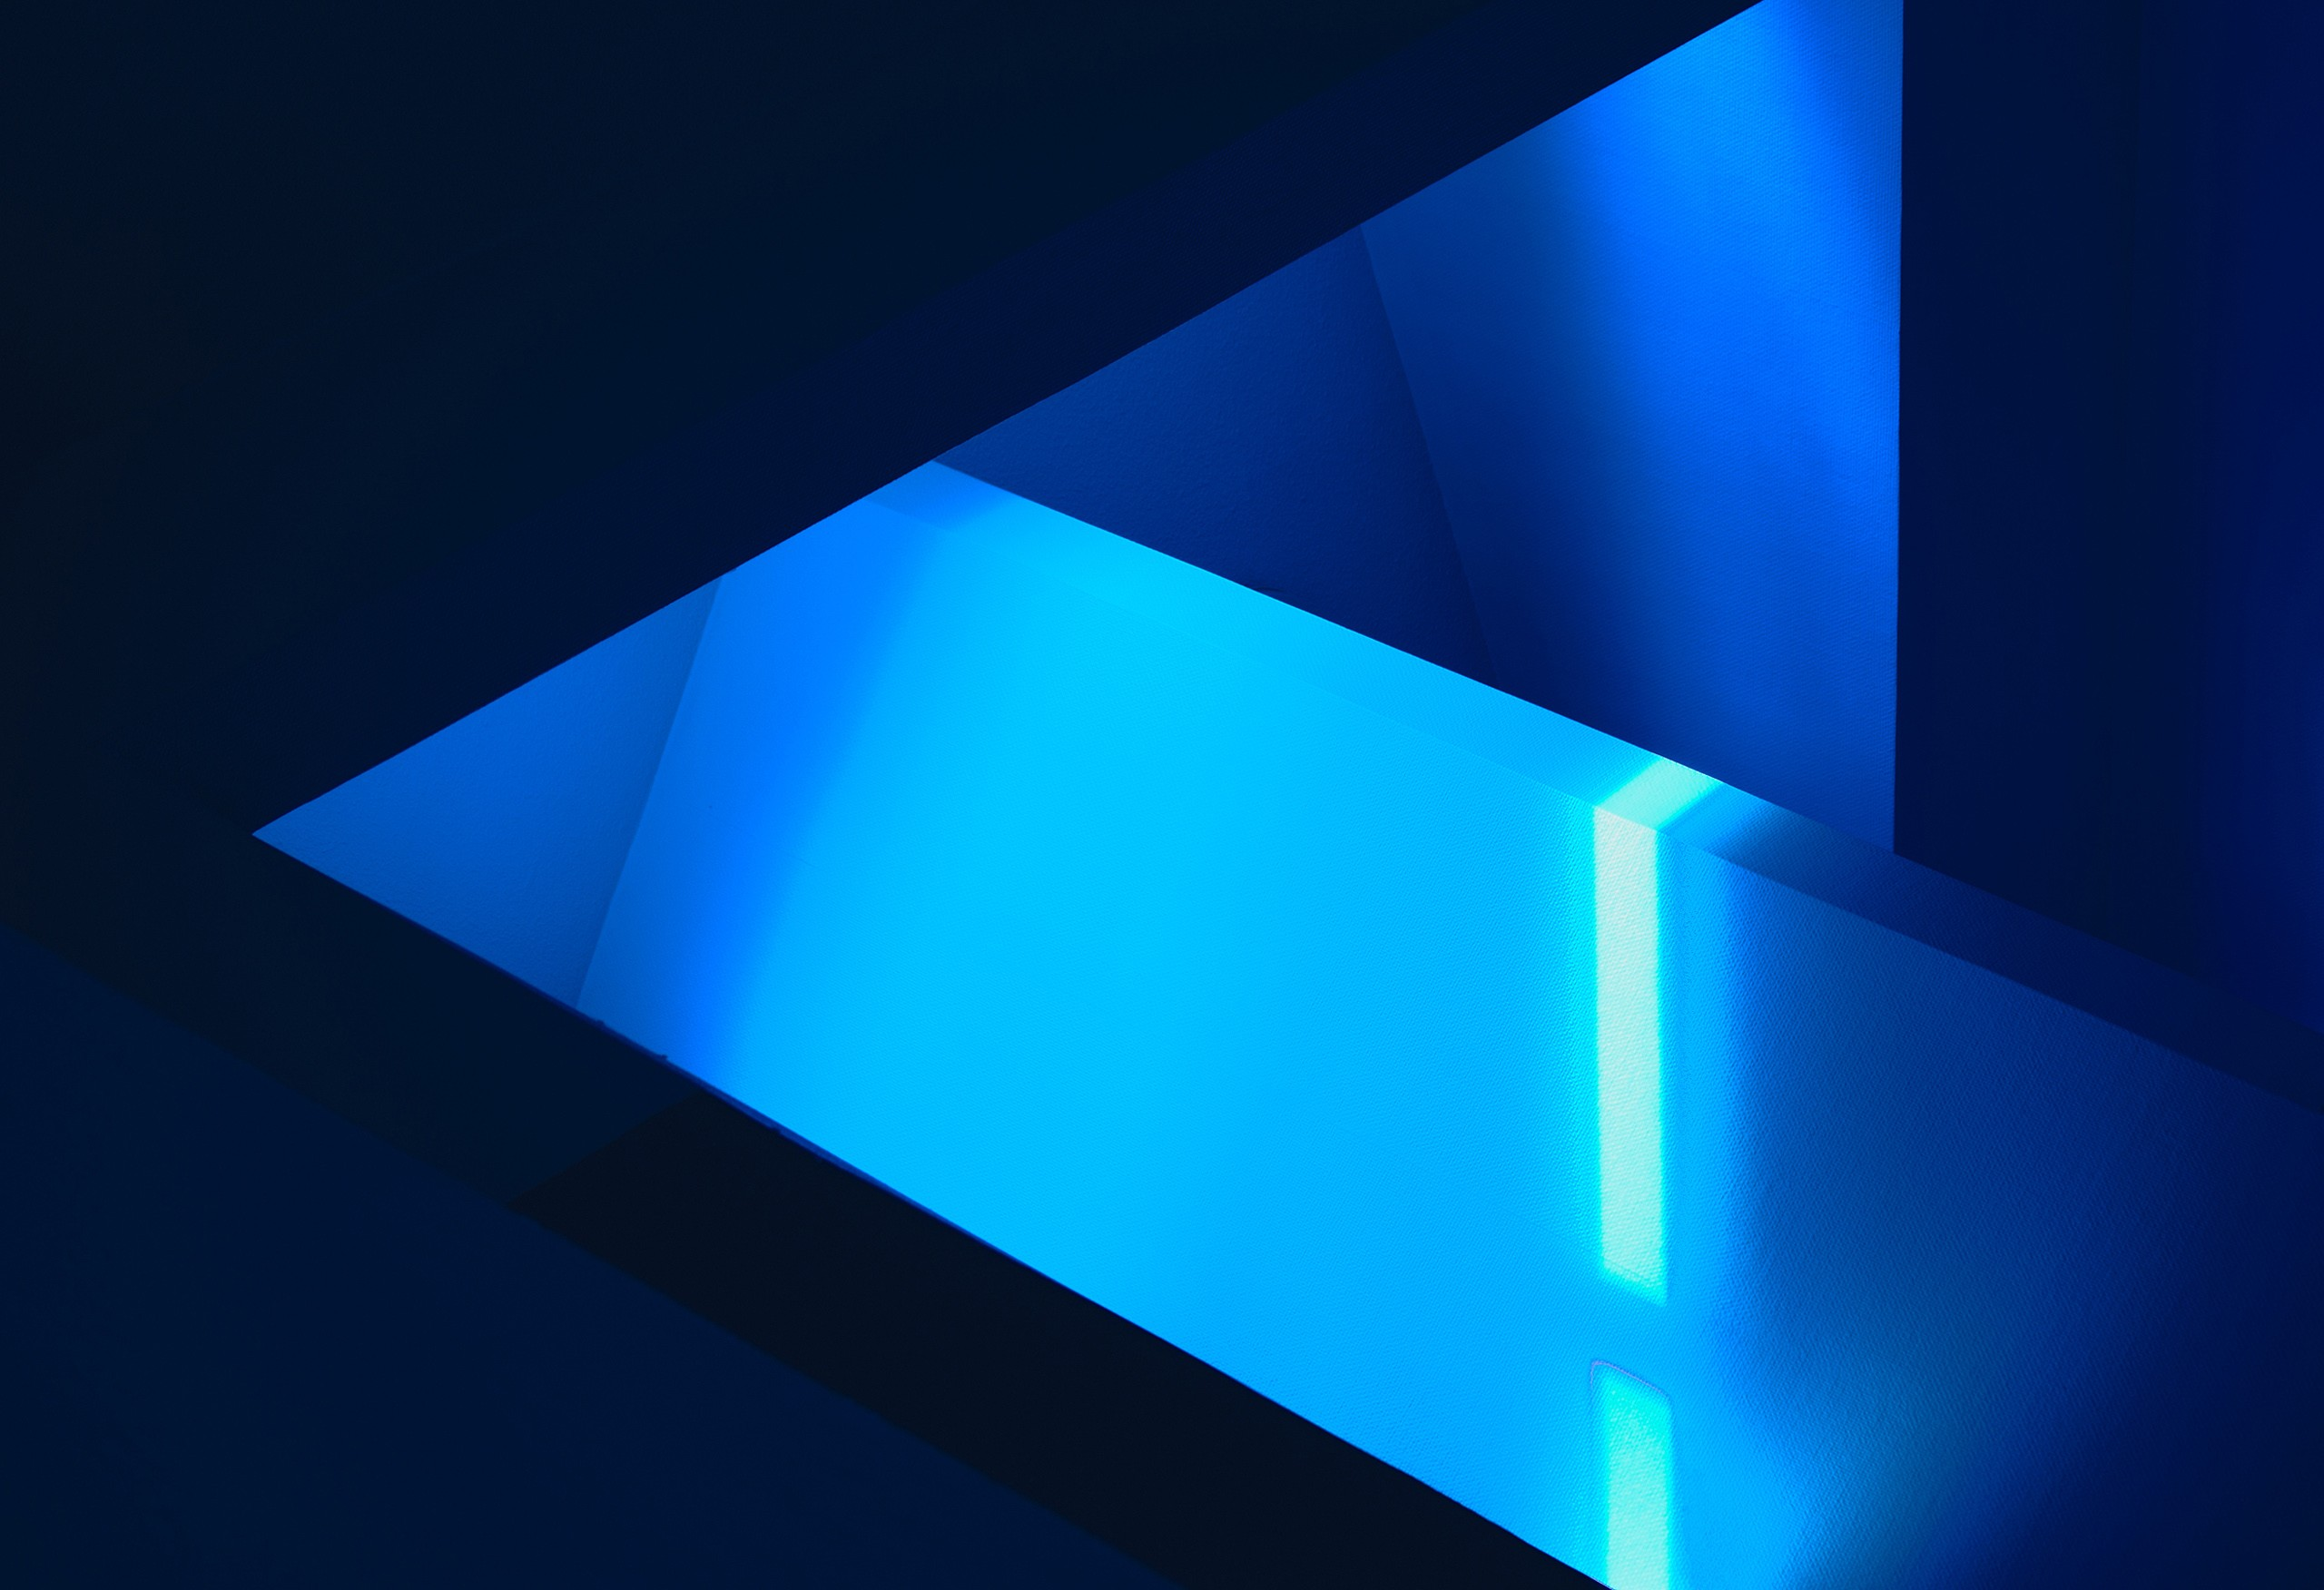 geometric wallpaper 2923